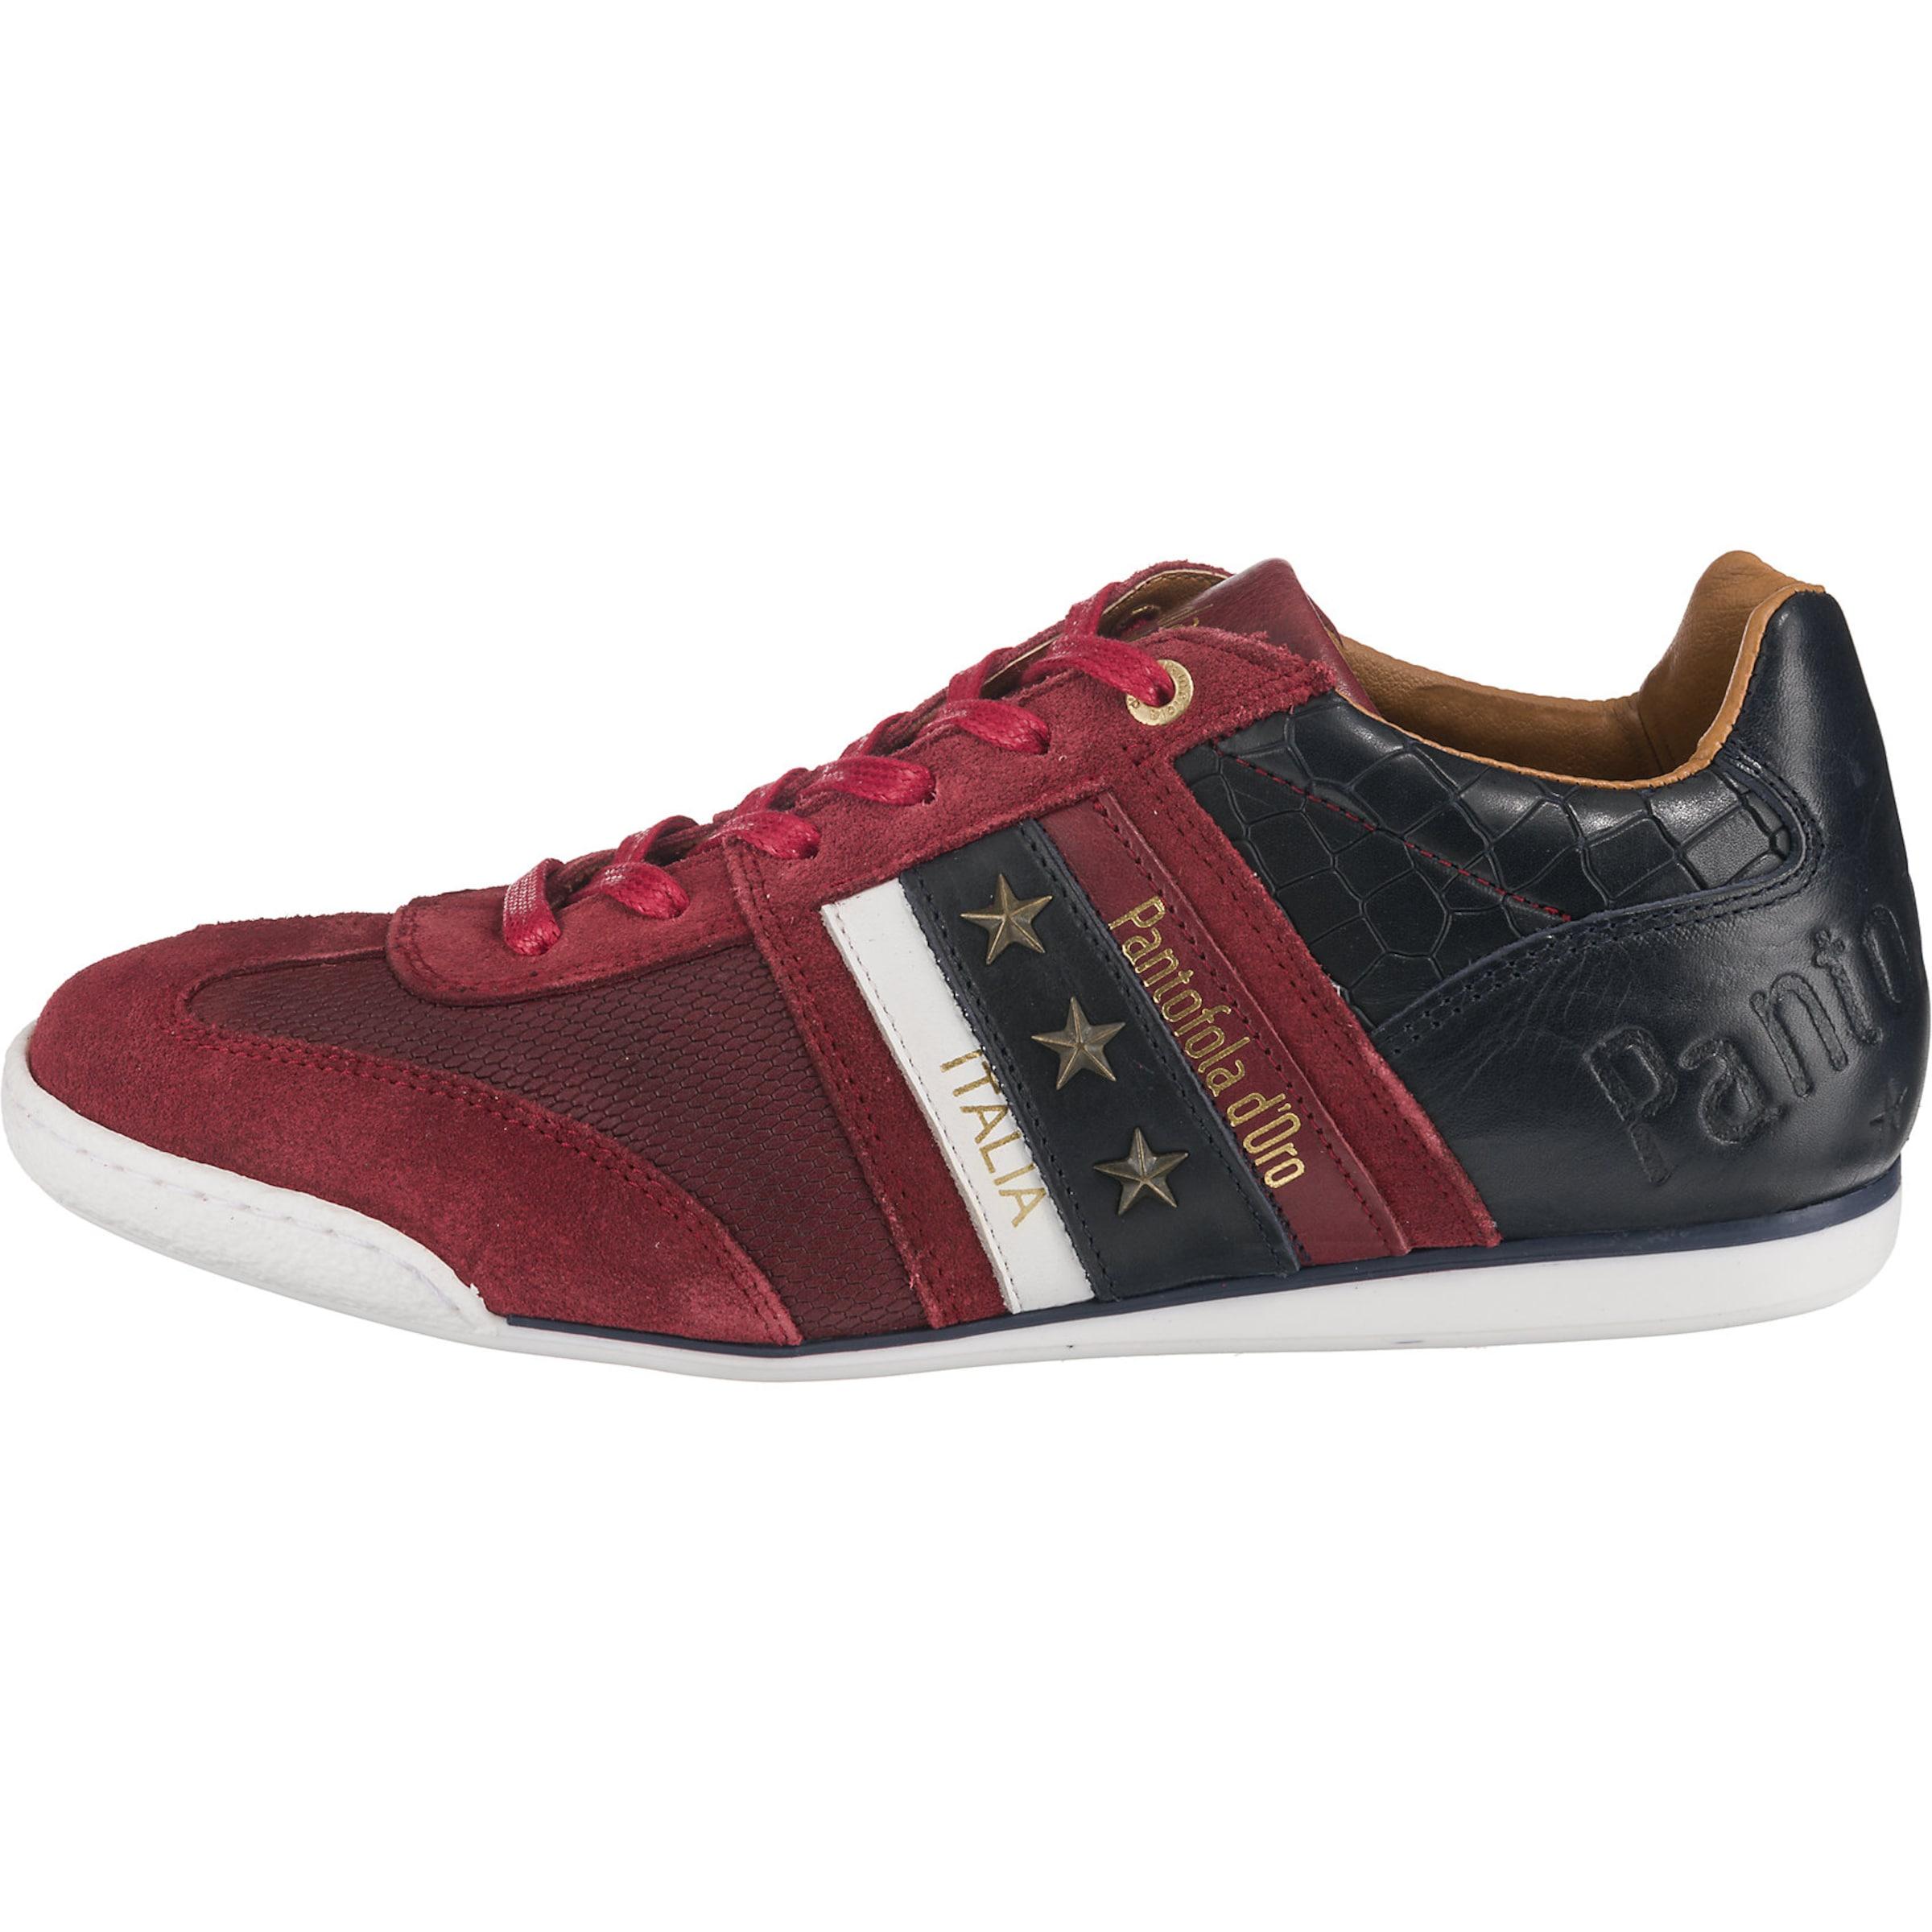 RotSchwarz D'oro Sneaker Pantofola In Weiß dxBCoe